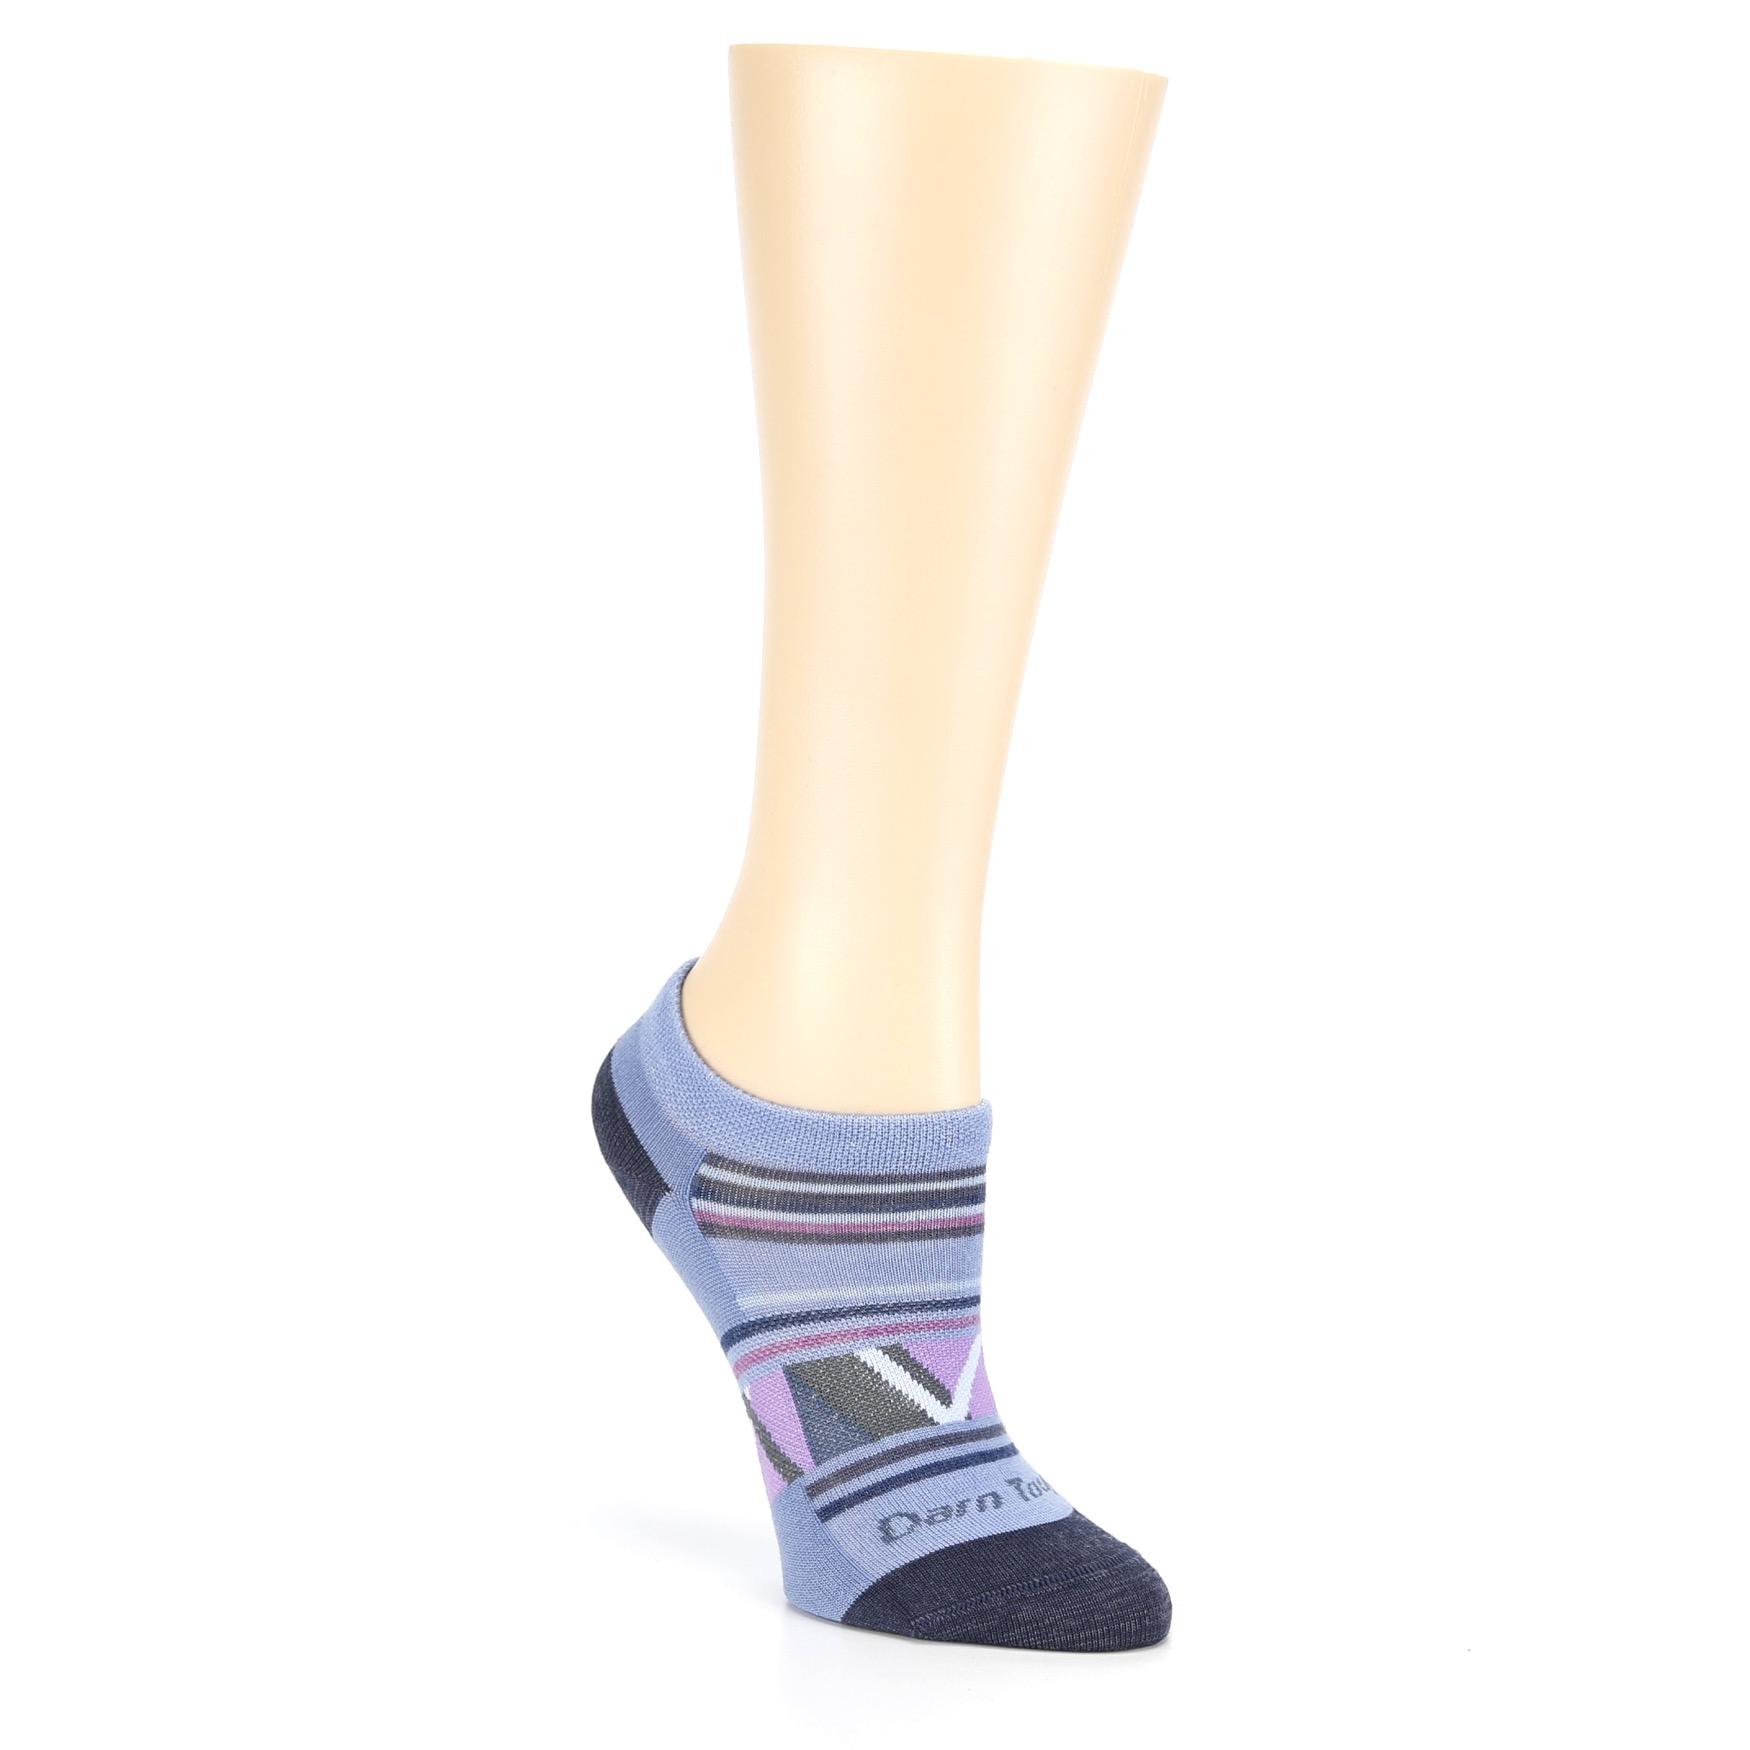 Blue Bridge No Show Light - Women's Casual Socks | boldSOCKS